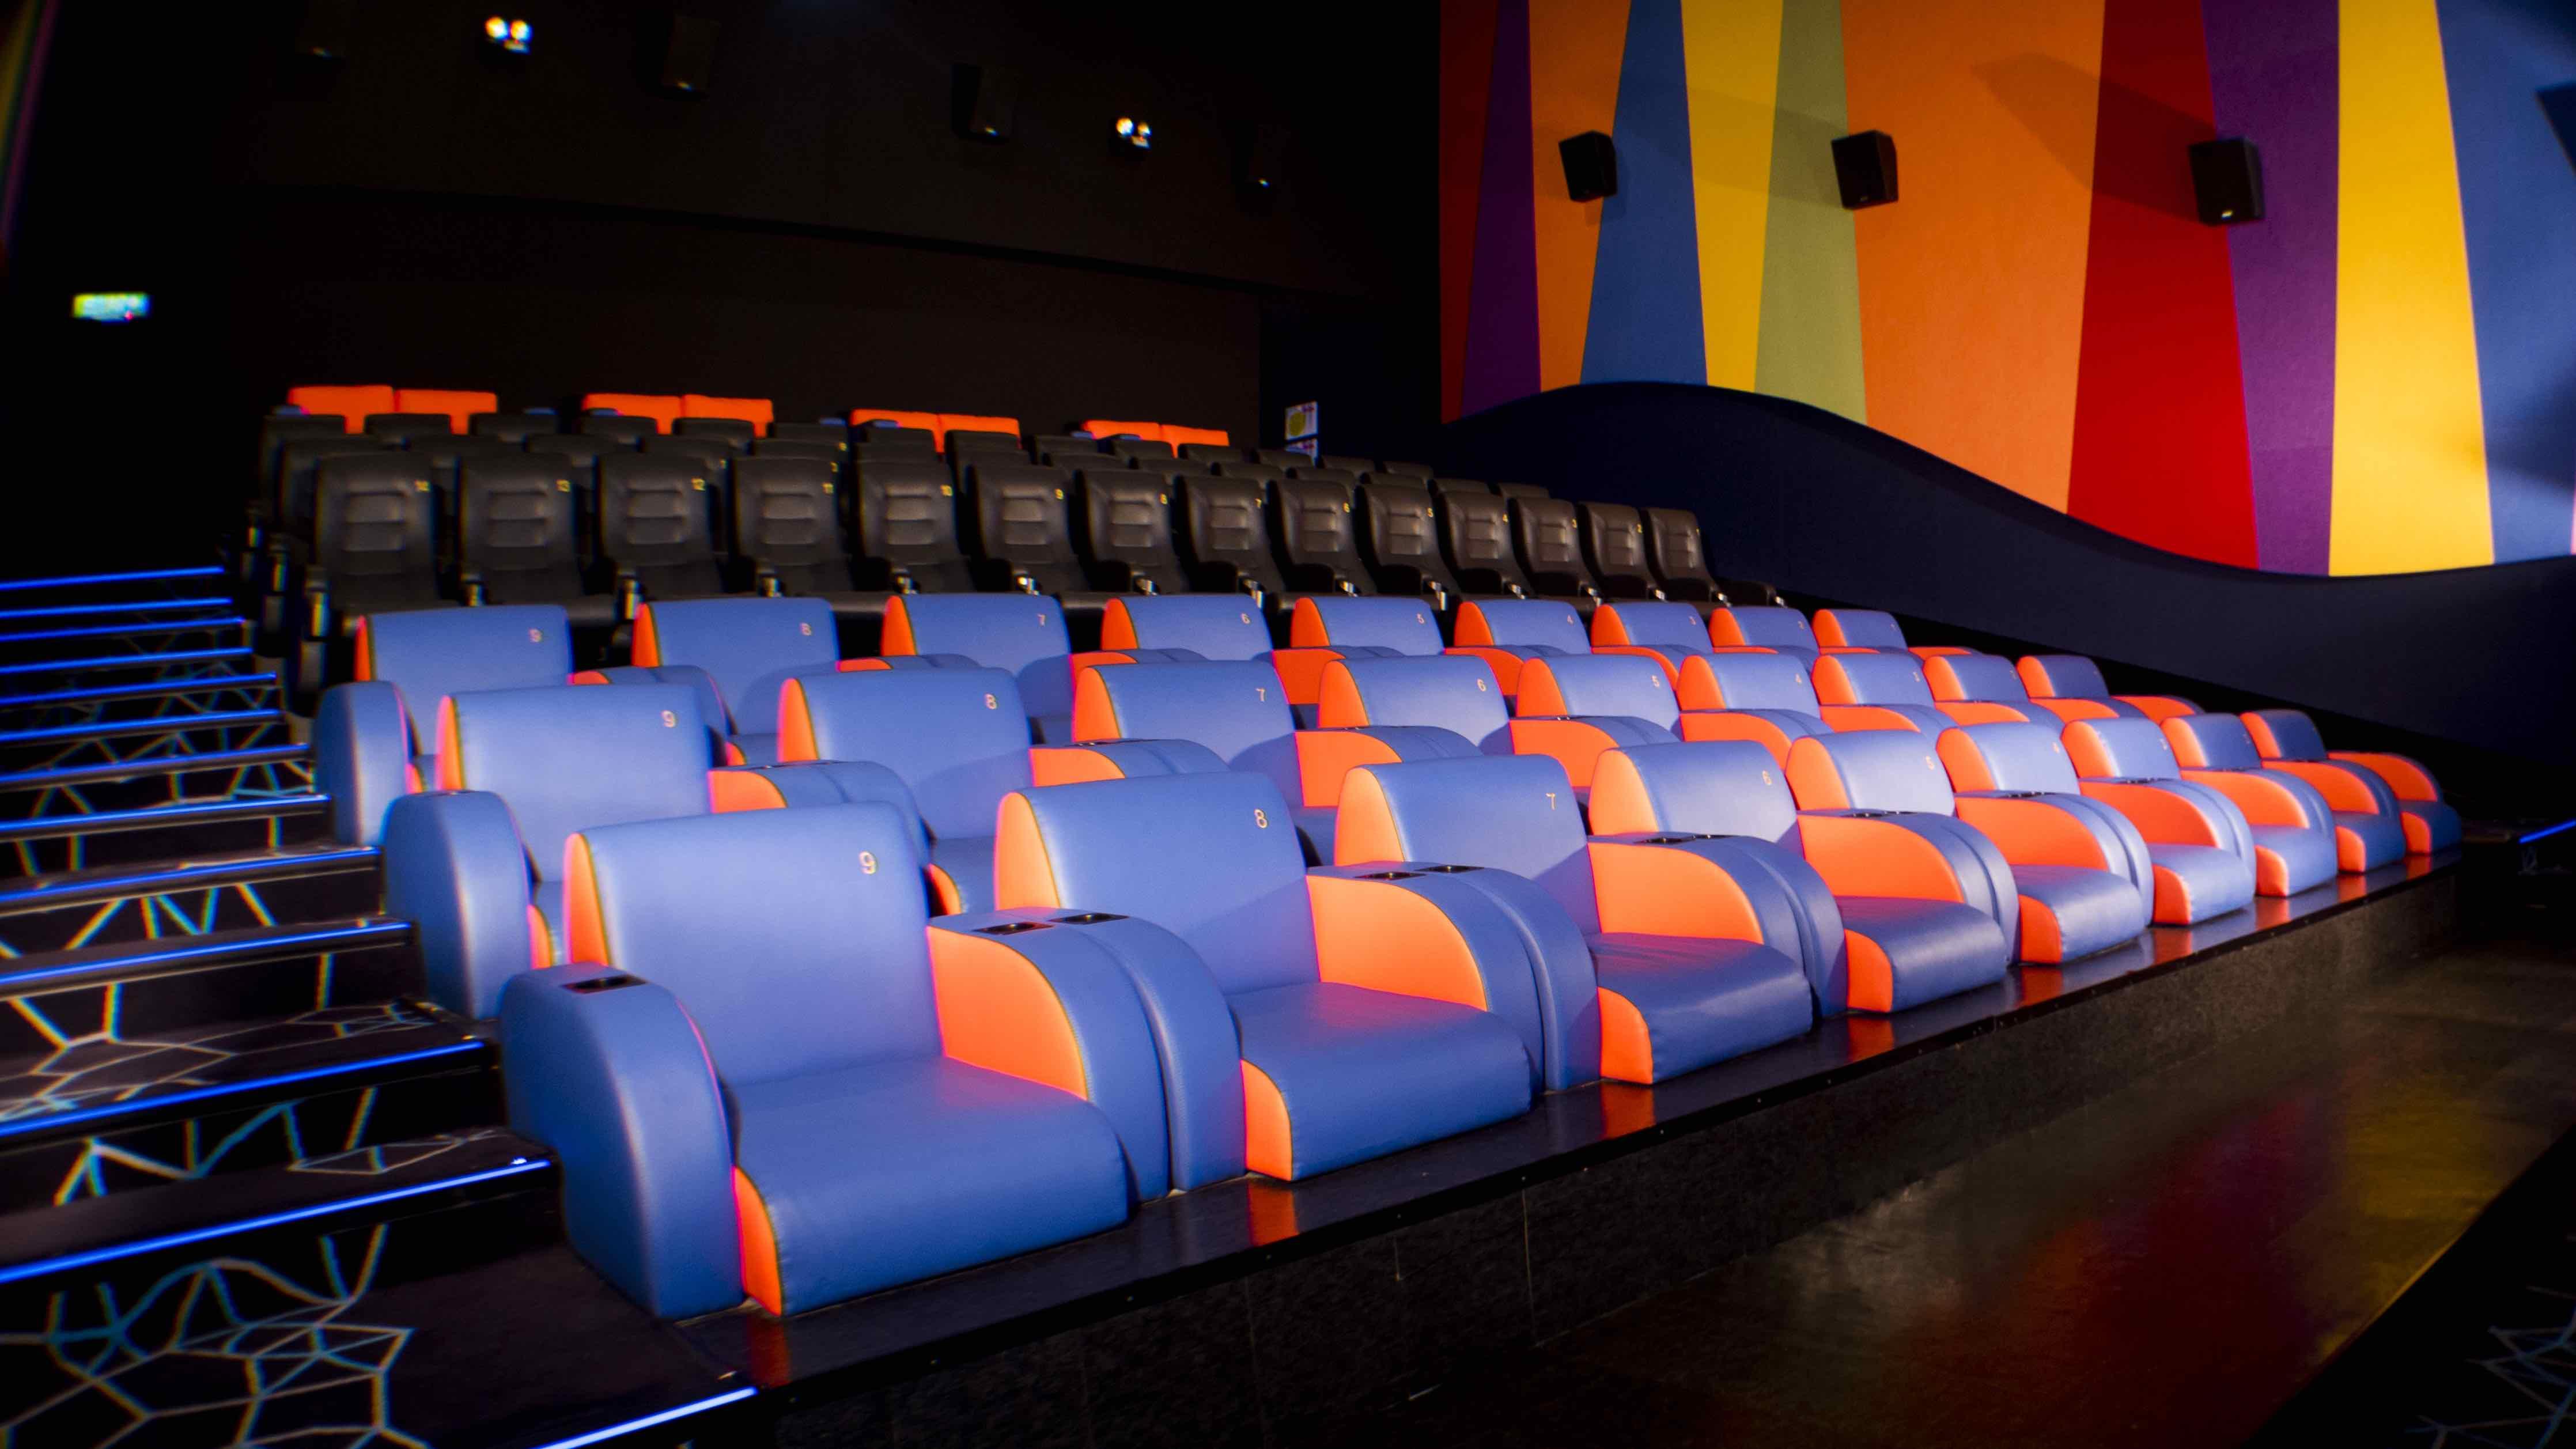 Mbo Cinemas Just Set Up The Largest Screen In The East Coast -> Fotos De Cinemas